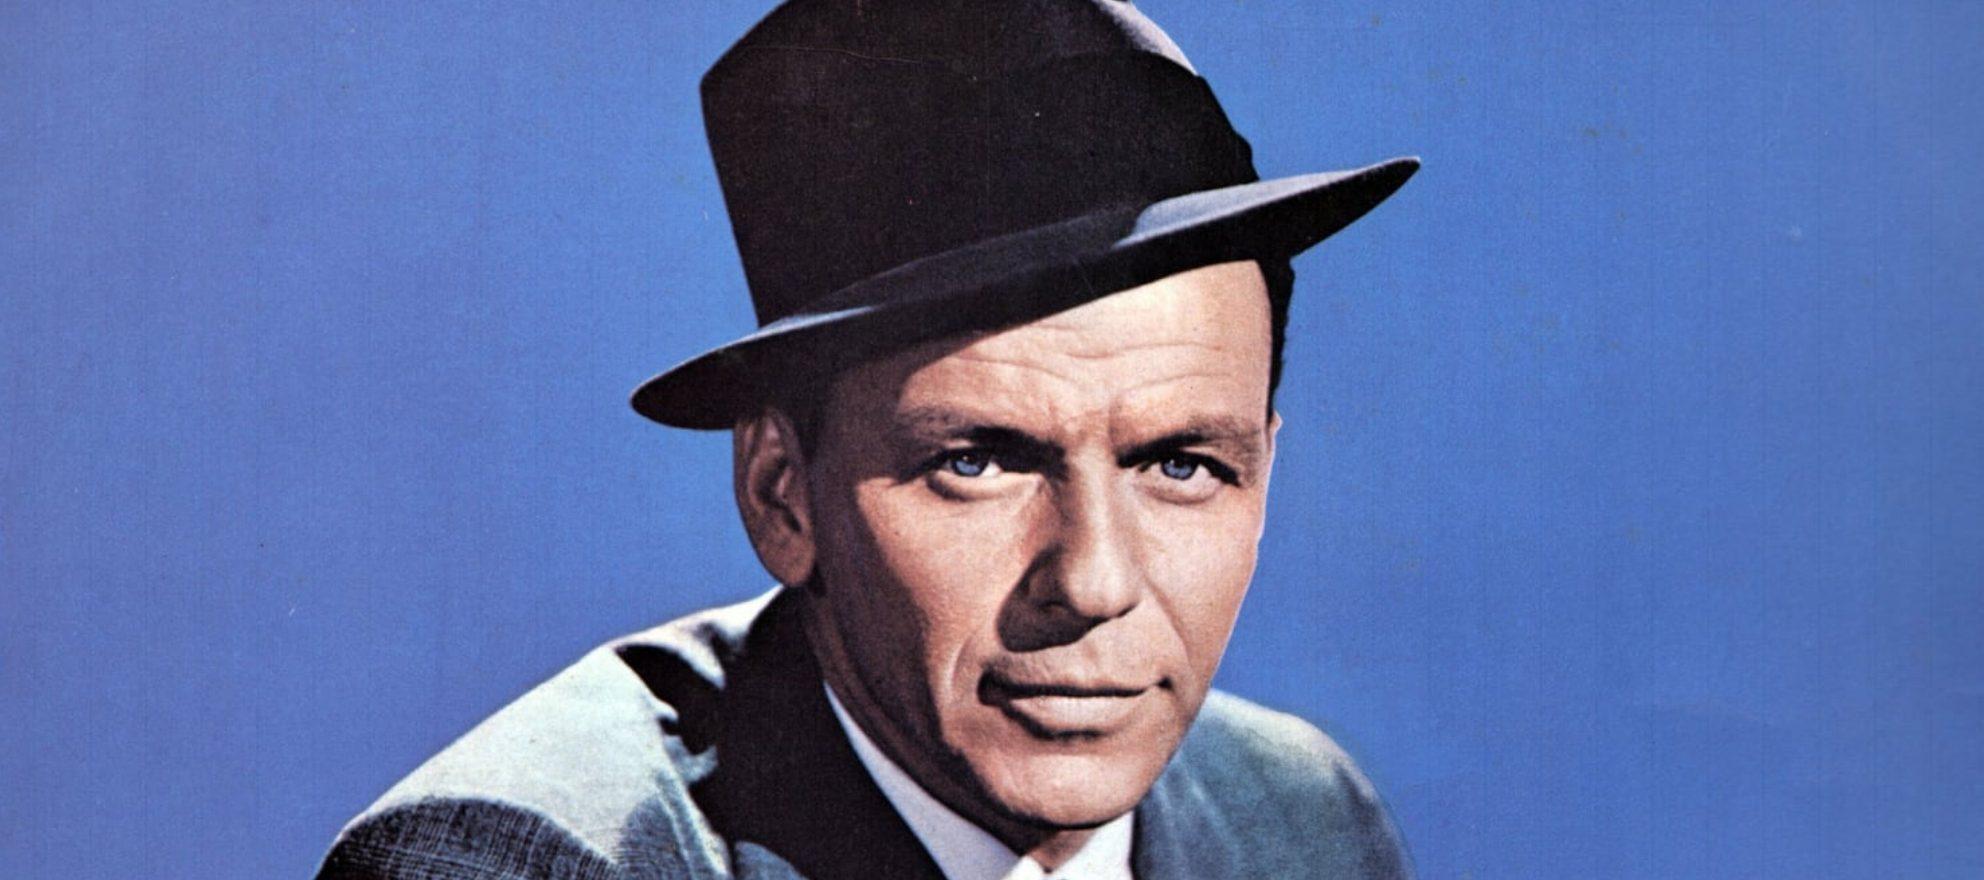 Frank Sinatra's beloved Malibu hangout hits market at $12.9M